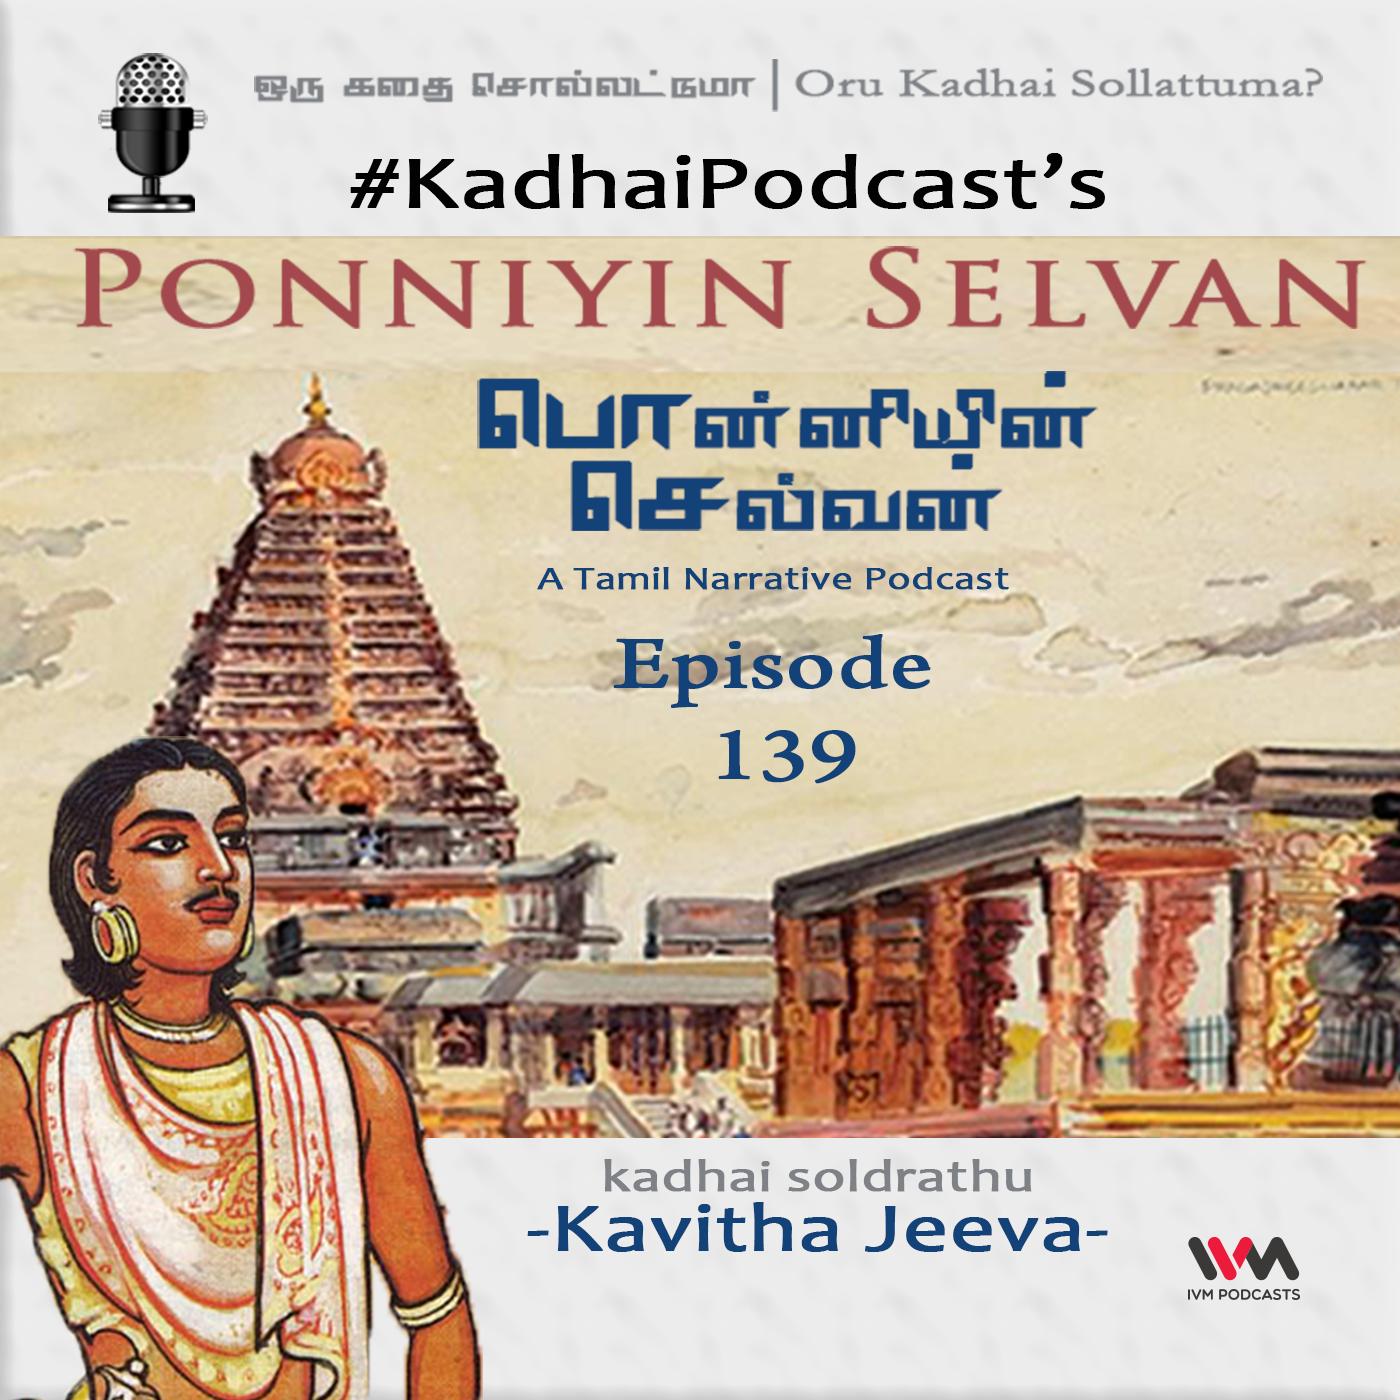 KadhaiPodcast's Ponniyin Selvan - Episode # 139